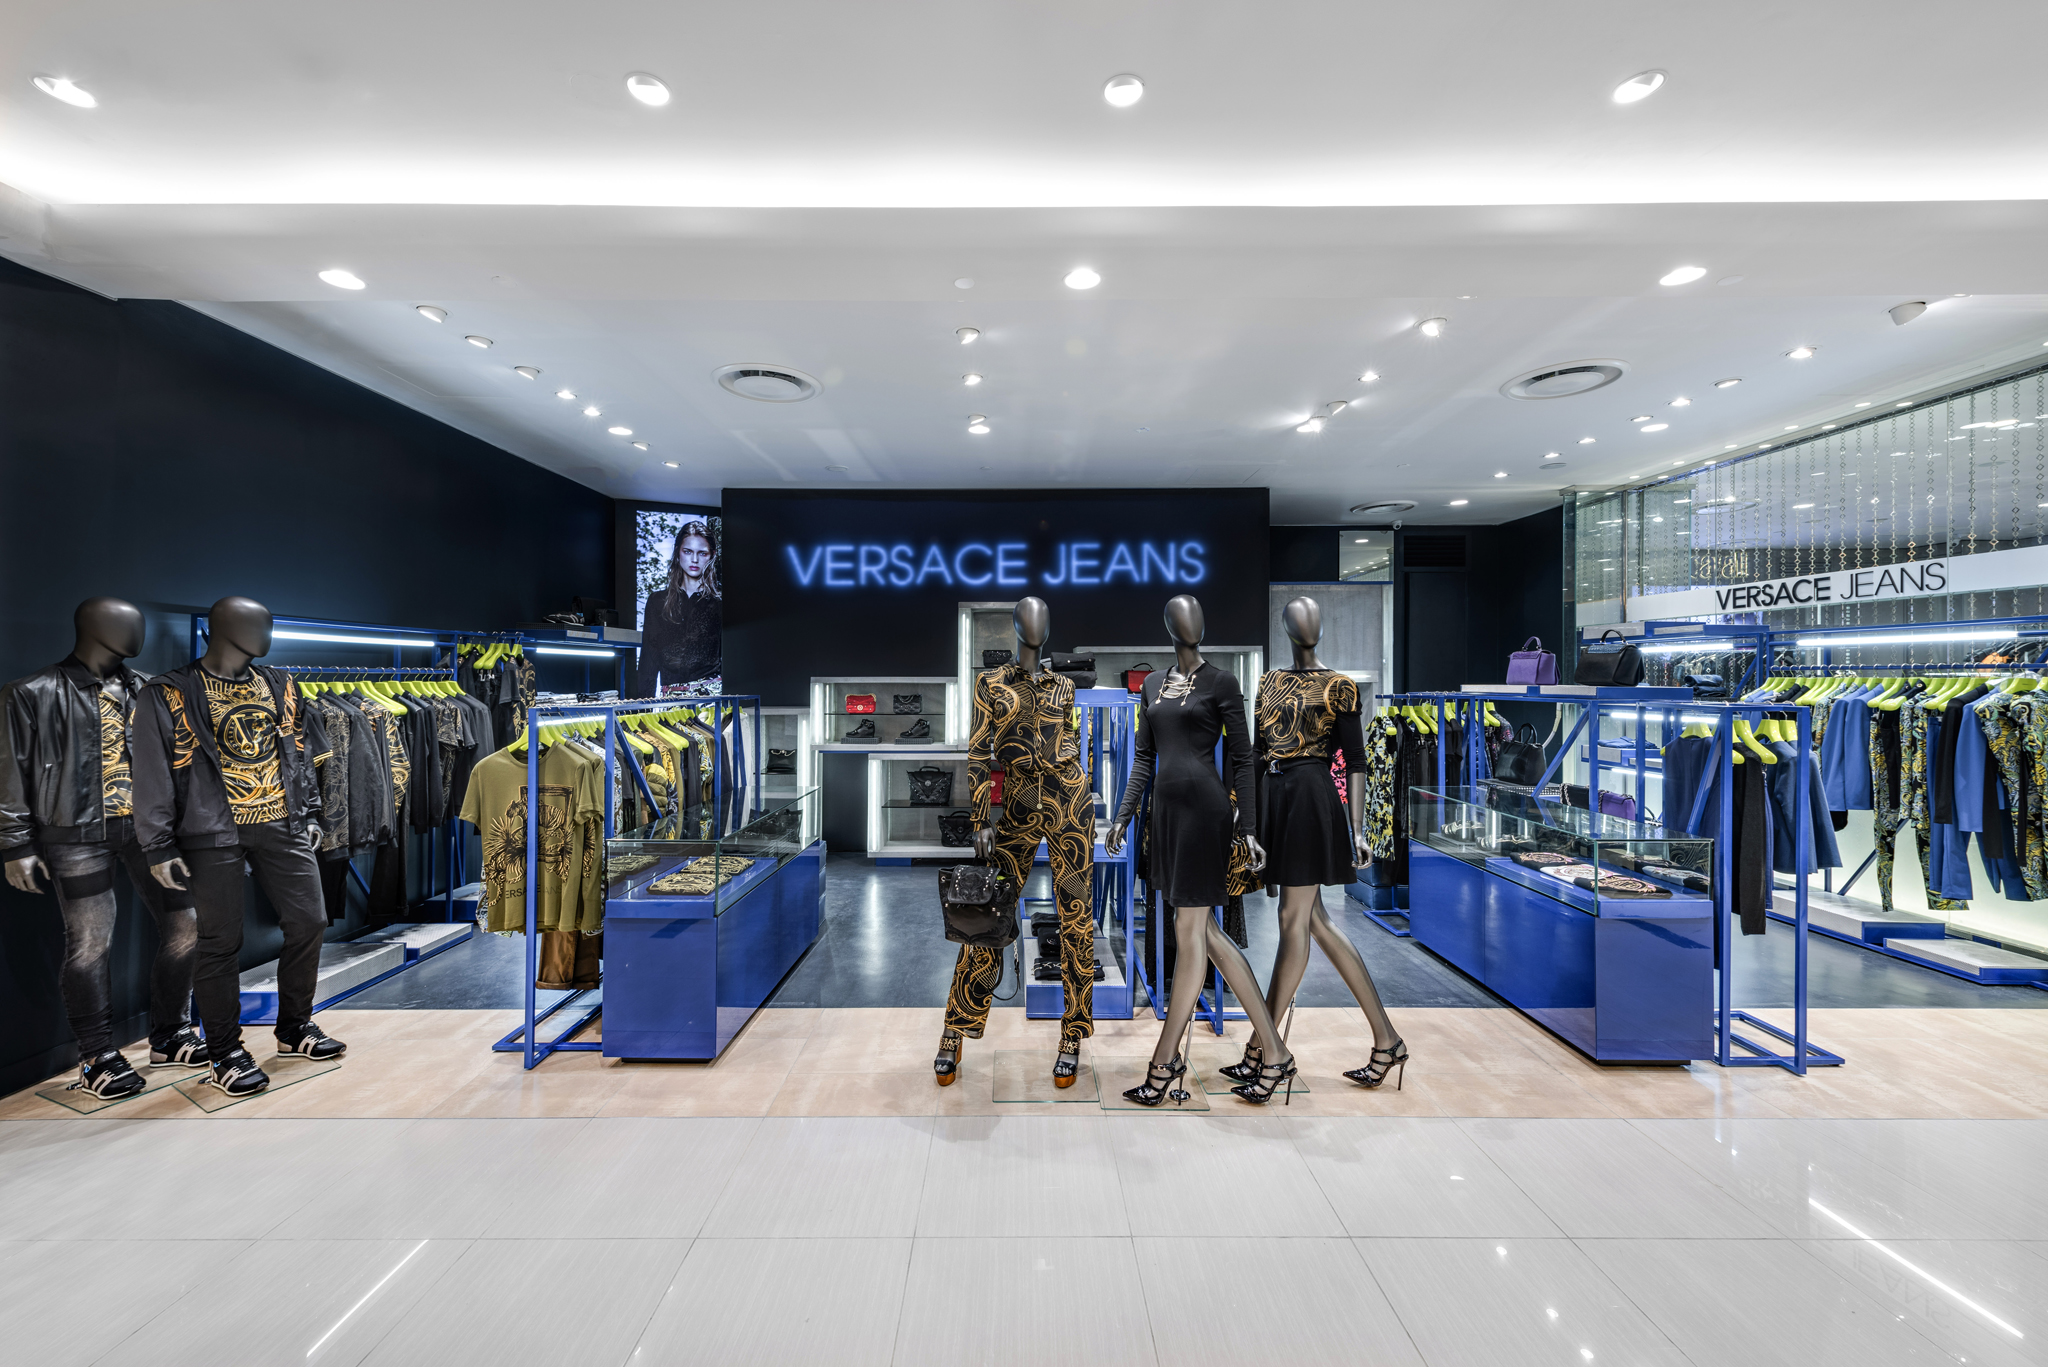 20160729 - Versace Jean - HCM - Commercial - Interior - Store - Retouch 0001.jpg